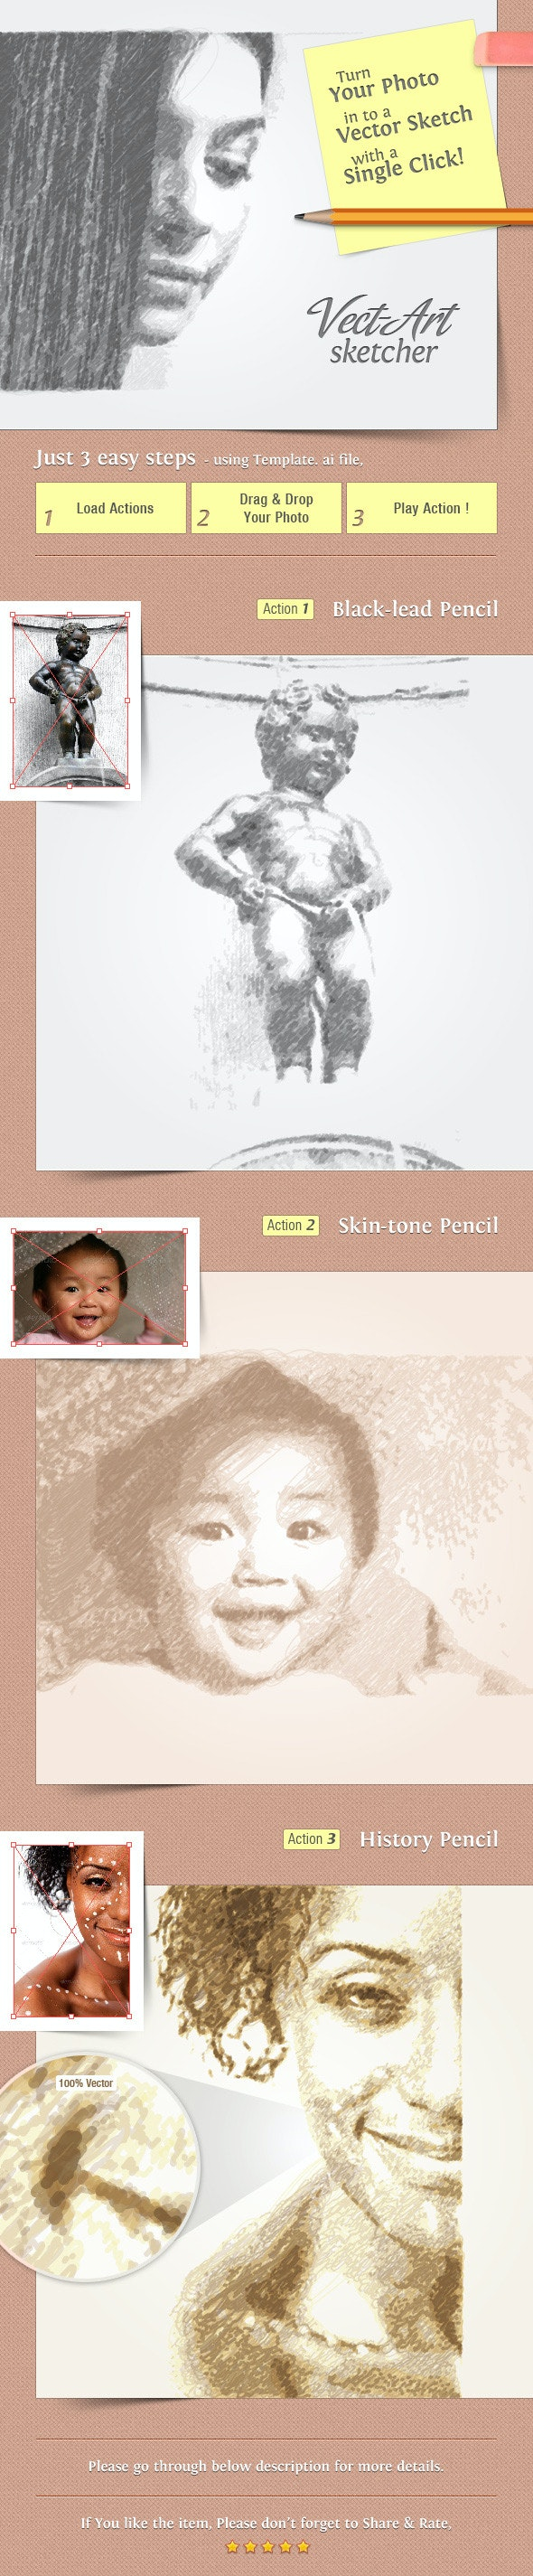 Vect-Art Sketcher - Illustrator Actions Pack - Actions Illustrator